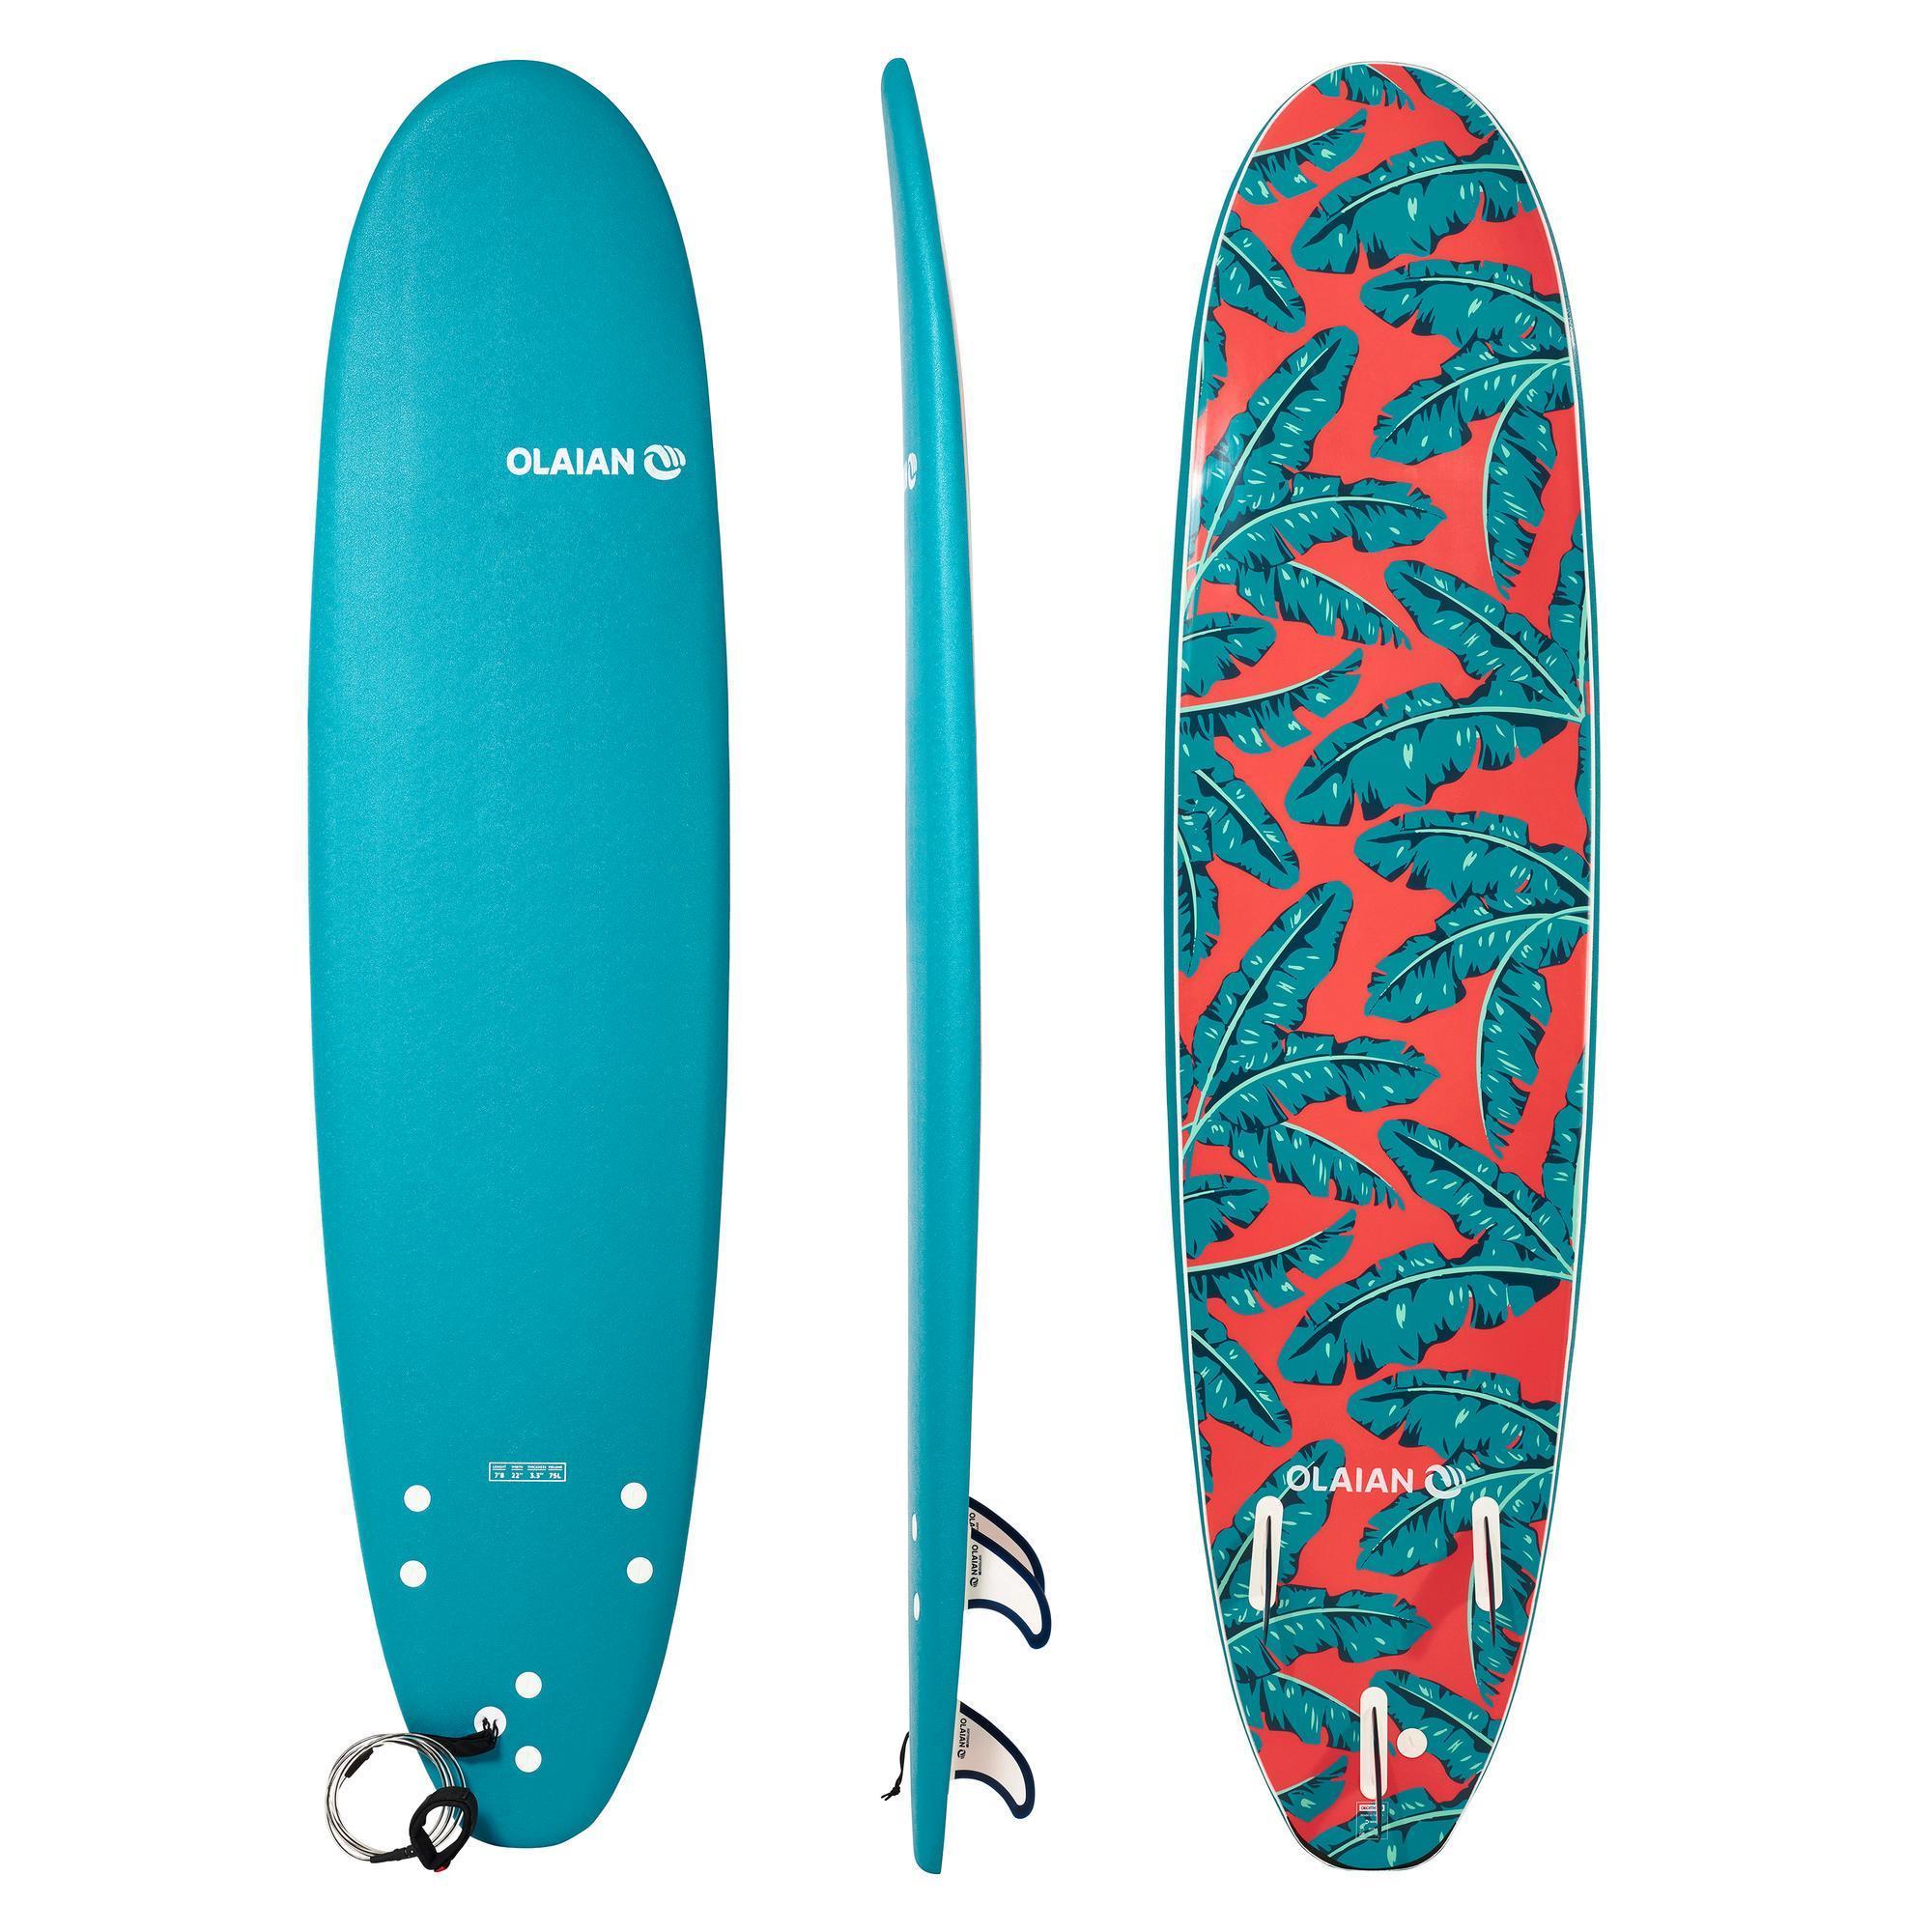 olaian tavola surf soft 500 7'8'' con leash e 3 pinne